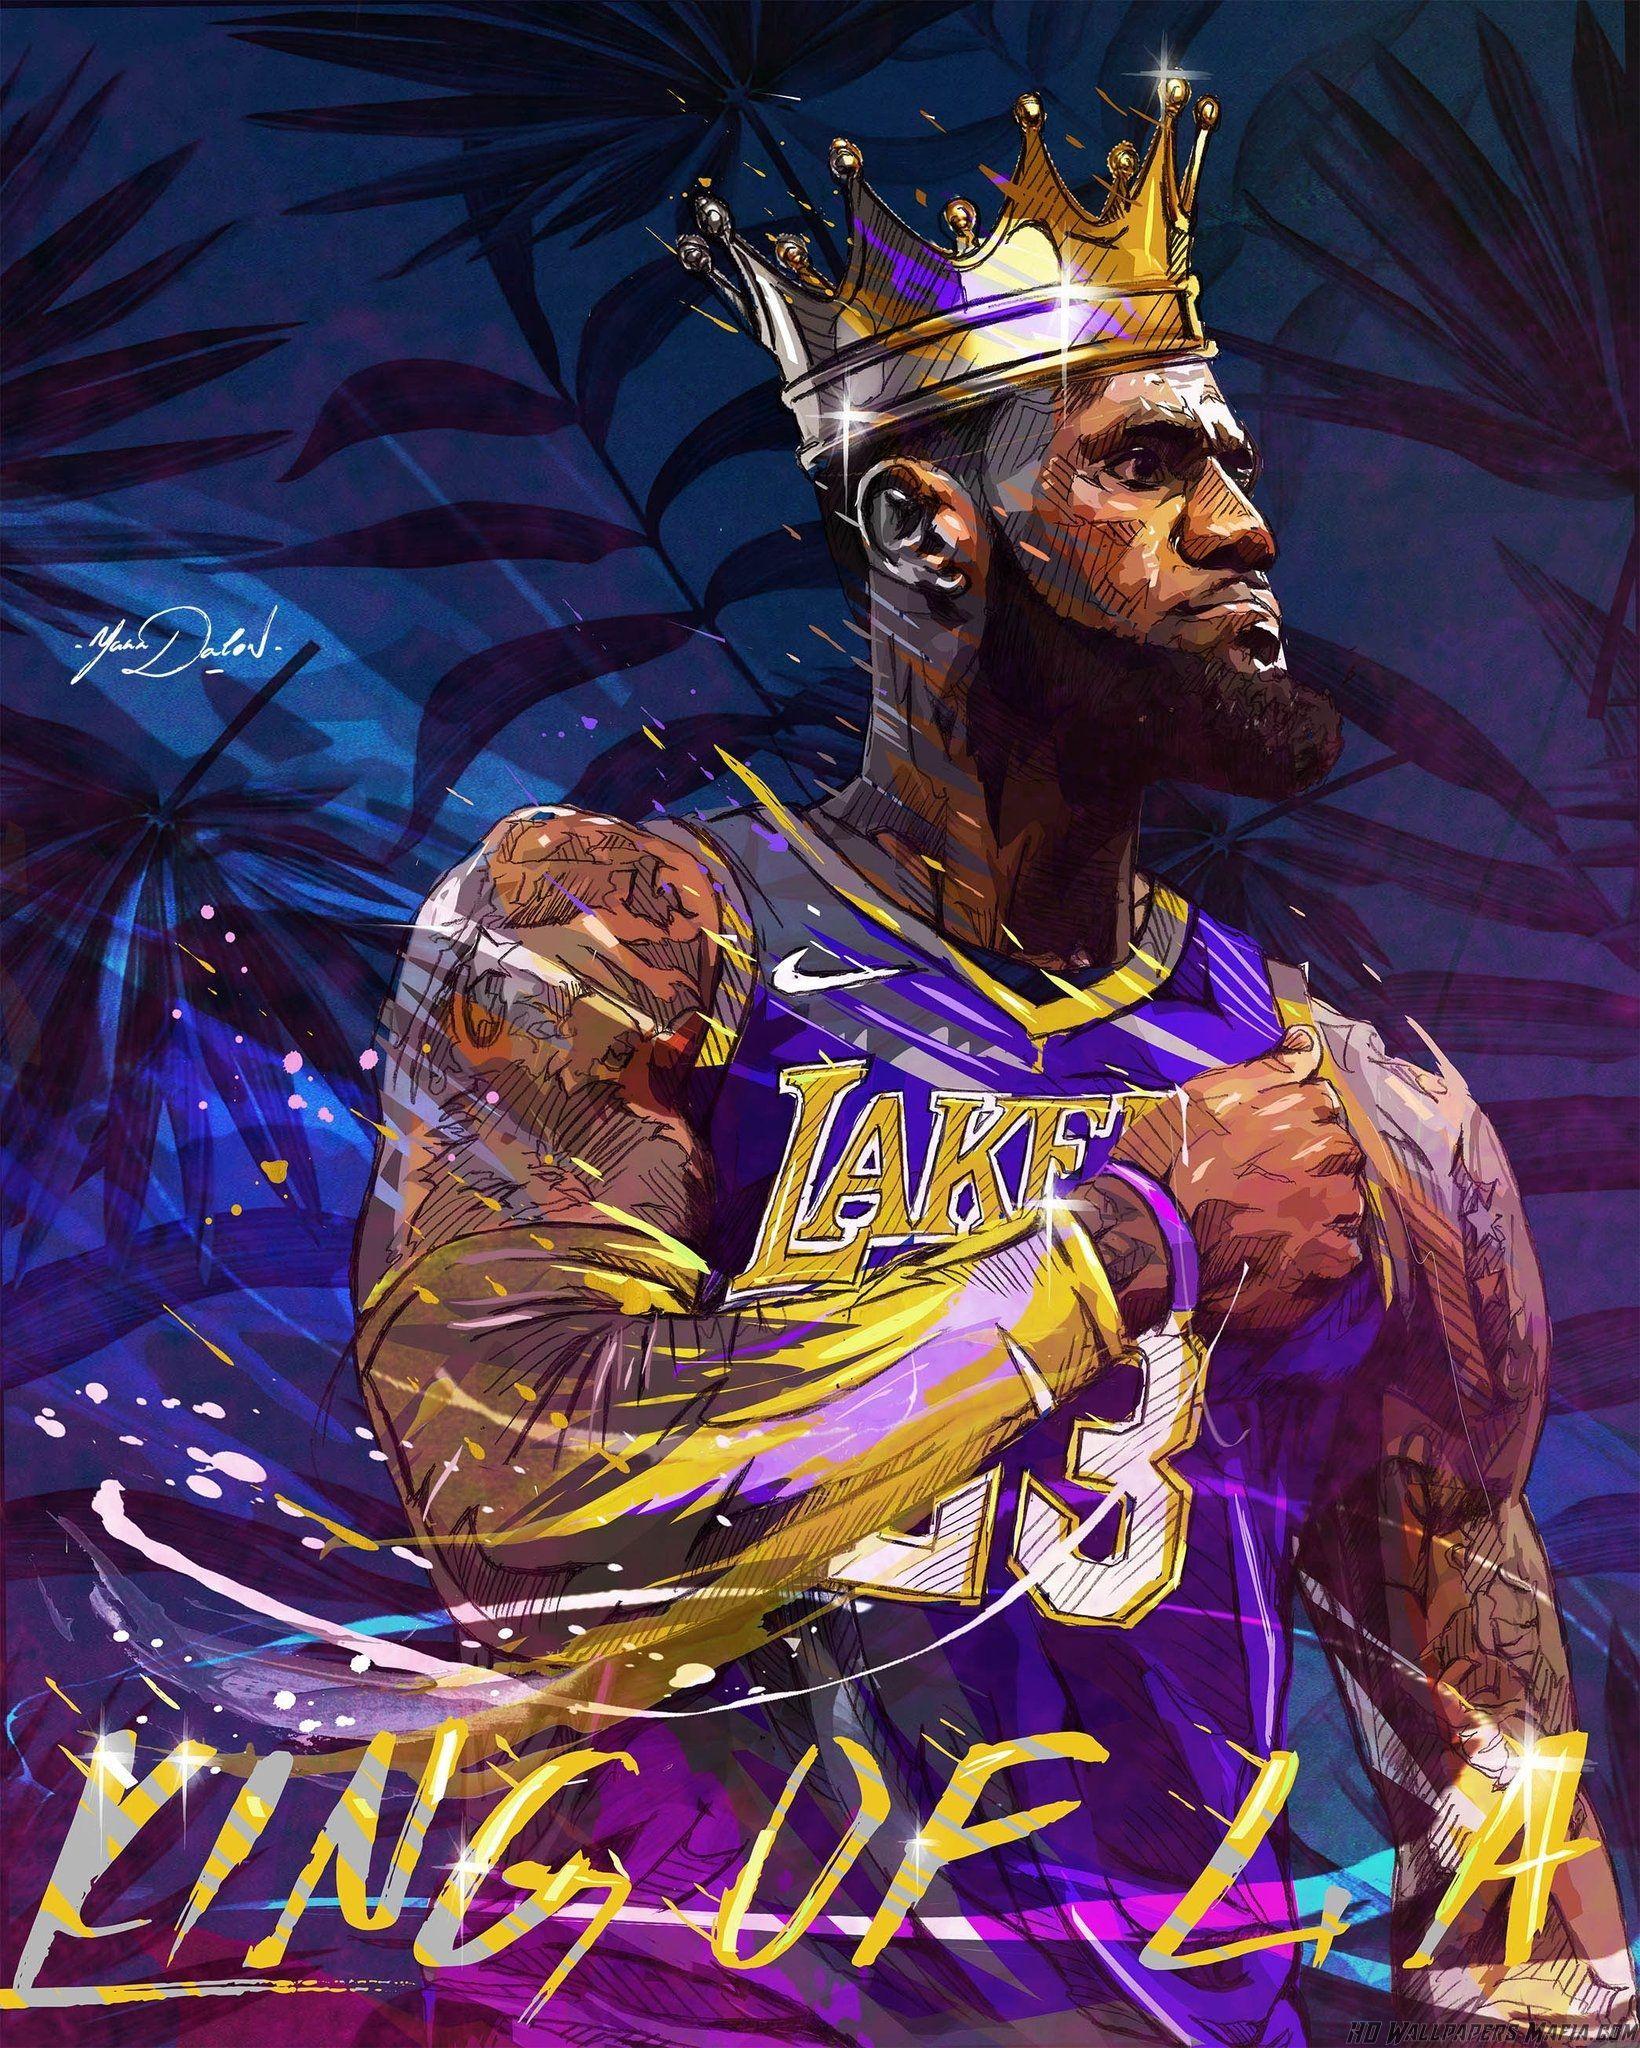 King LeBron James Wallpapers - Top Free